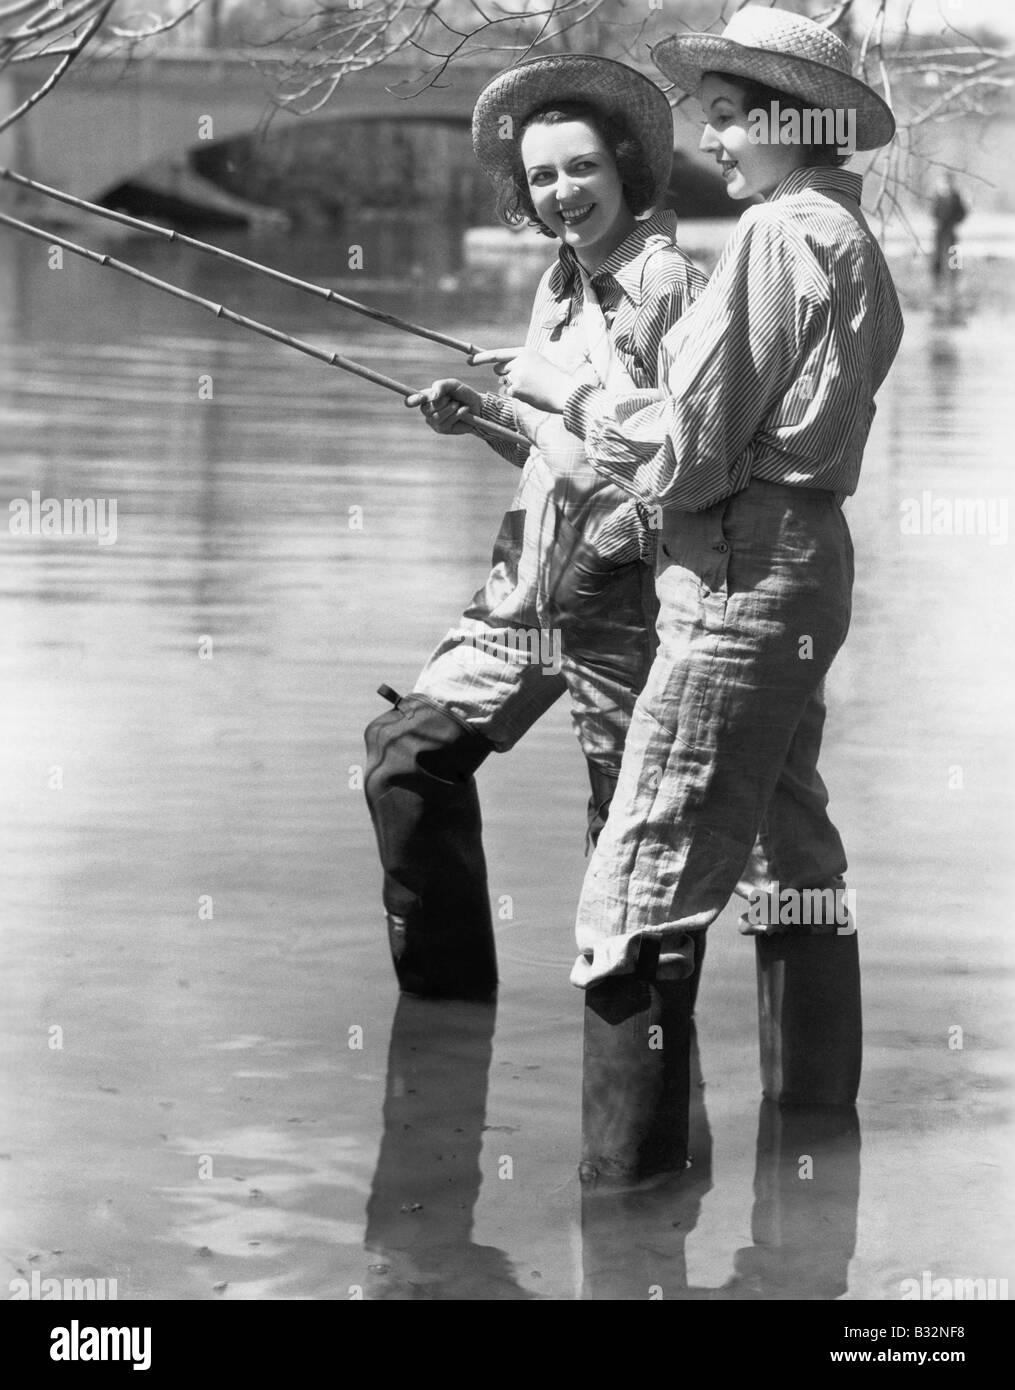 Two women fishing - Stock Image